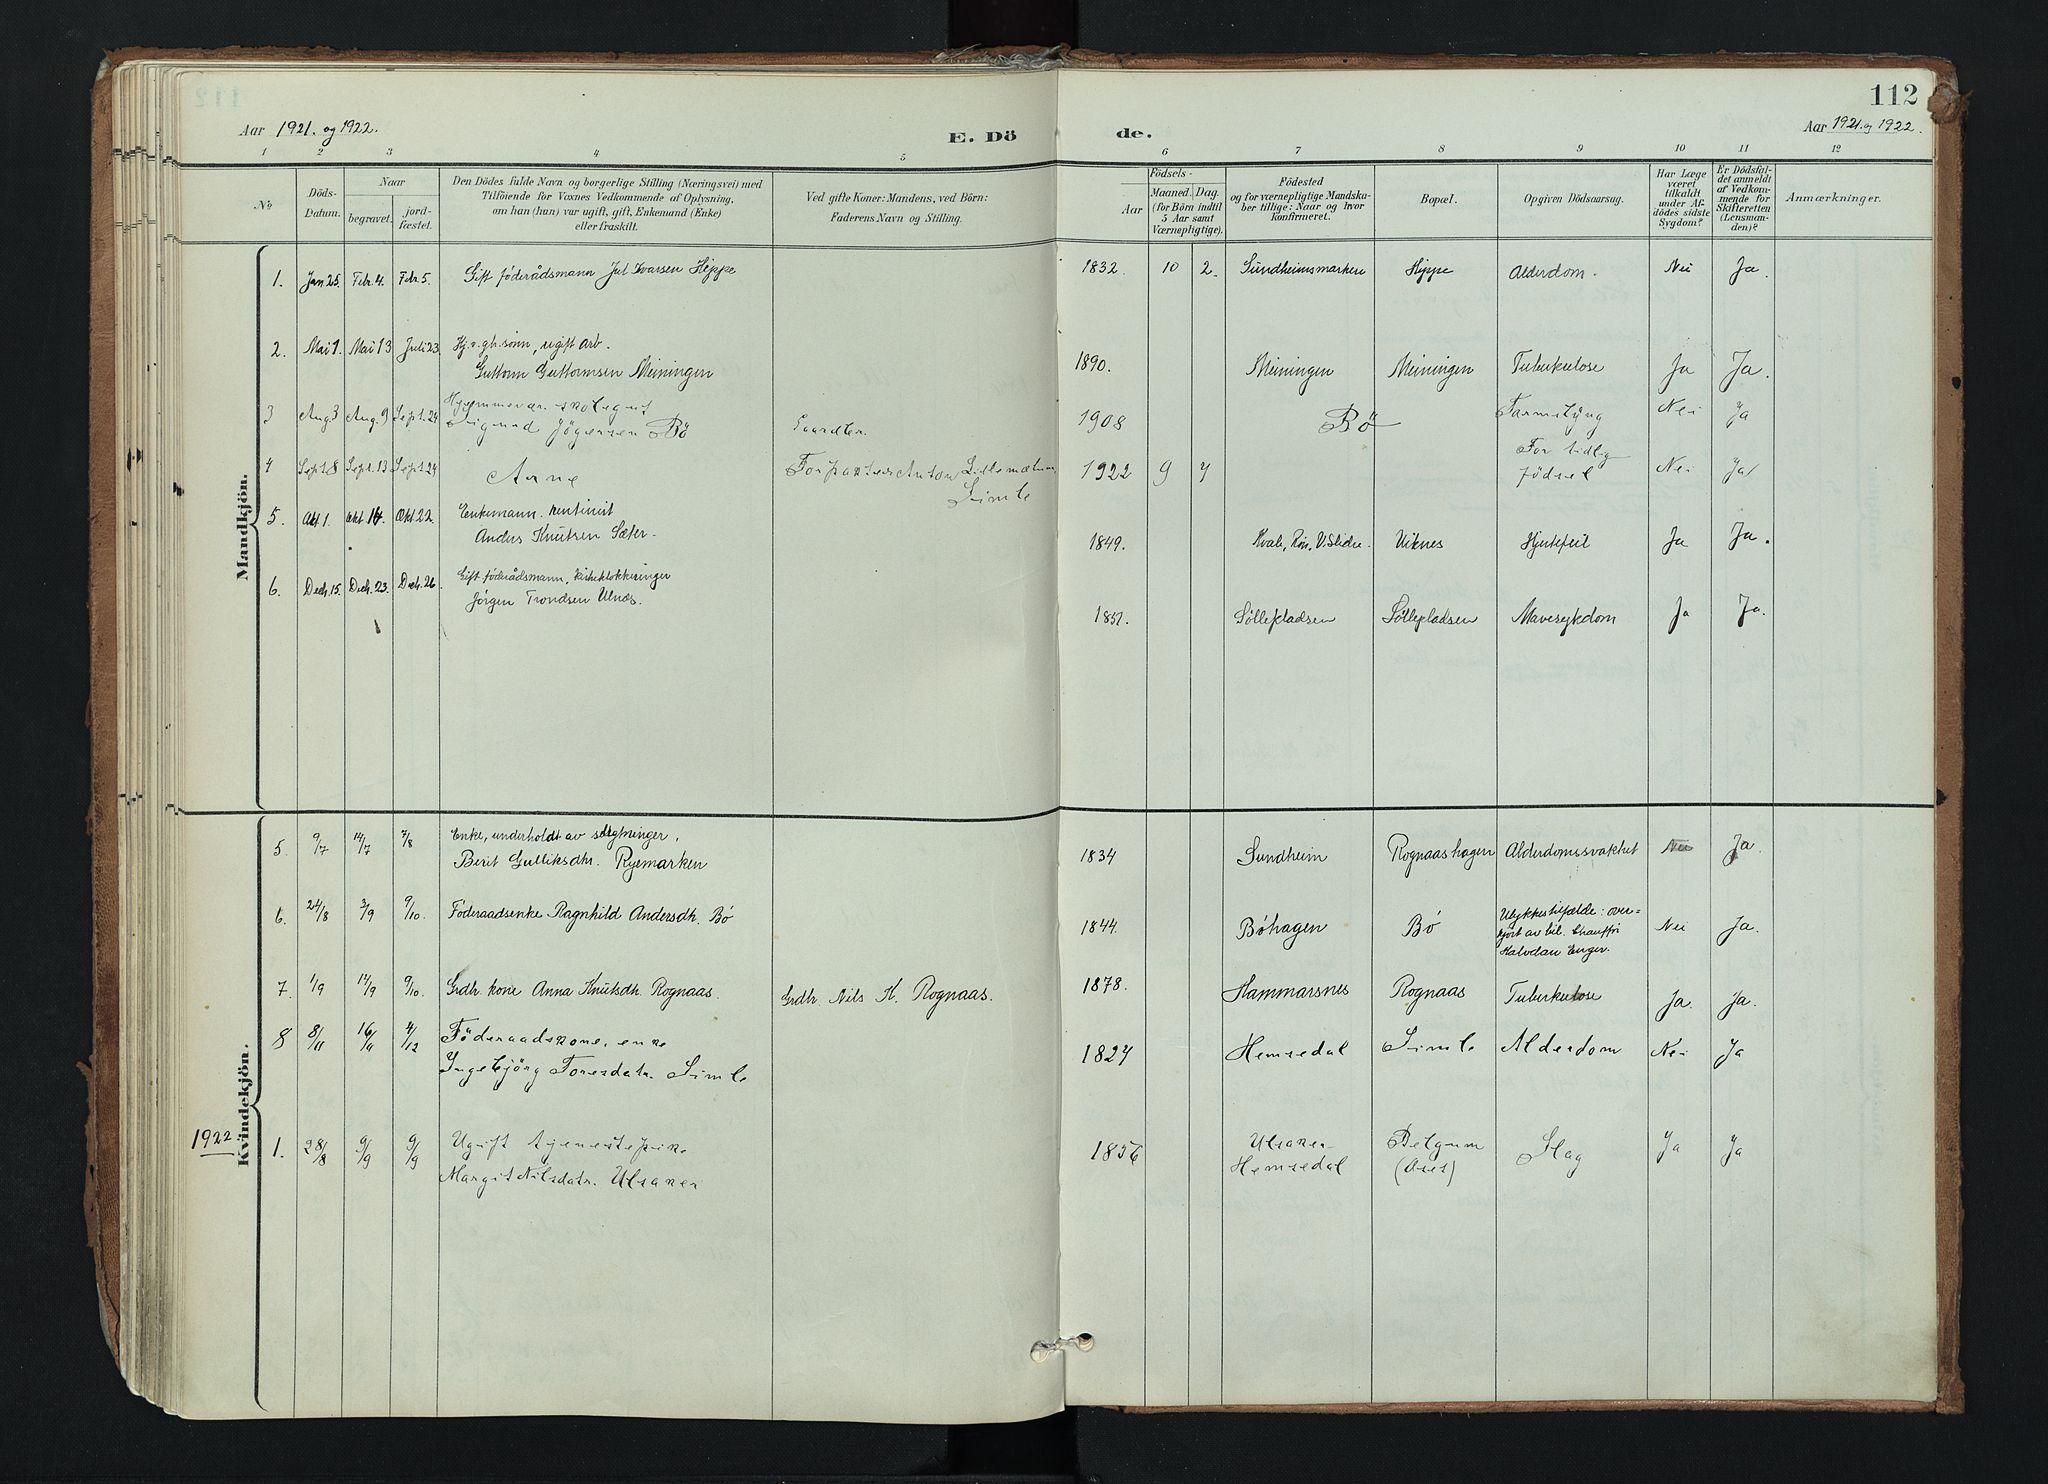 SAH, Nord-Aurdal prestekontor, Ministerialbok nr. 17, 1897-1926, s. 112